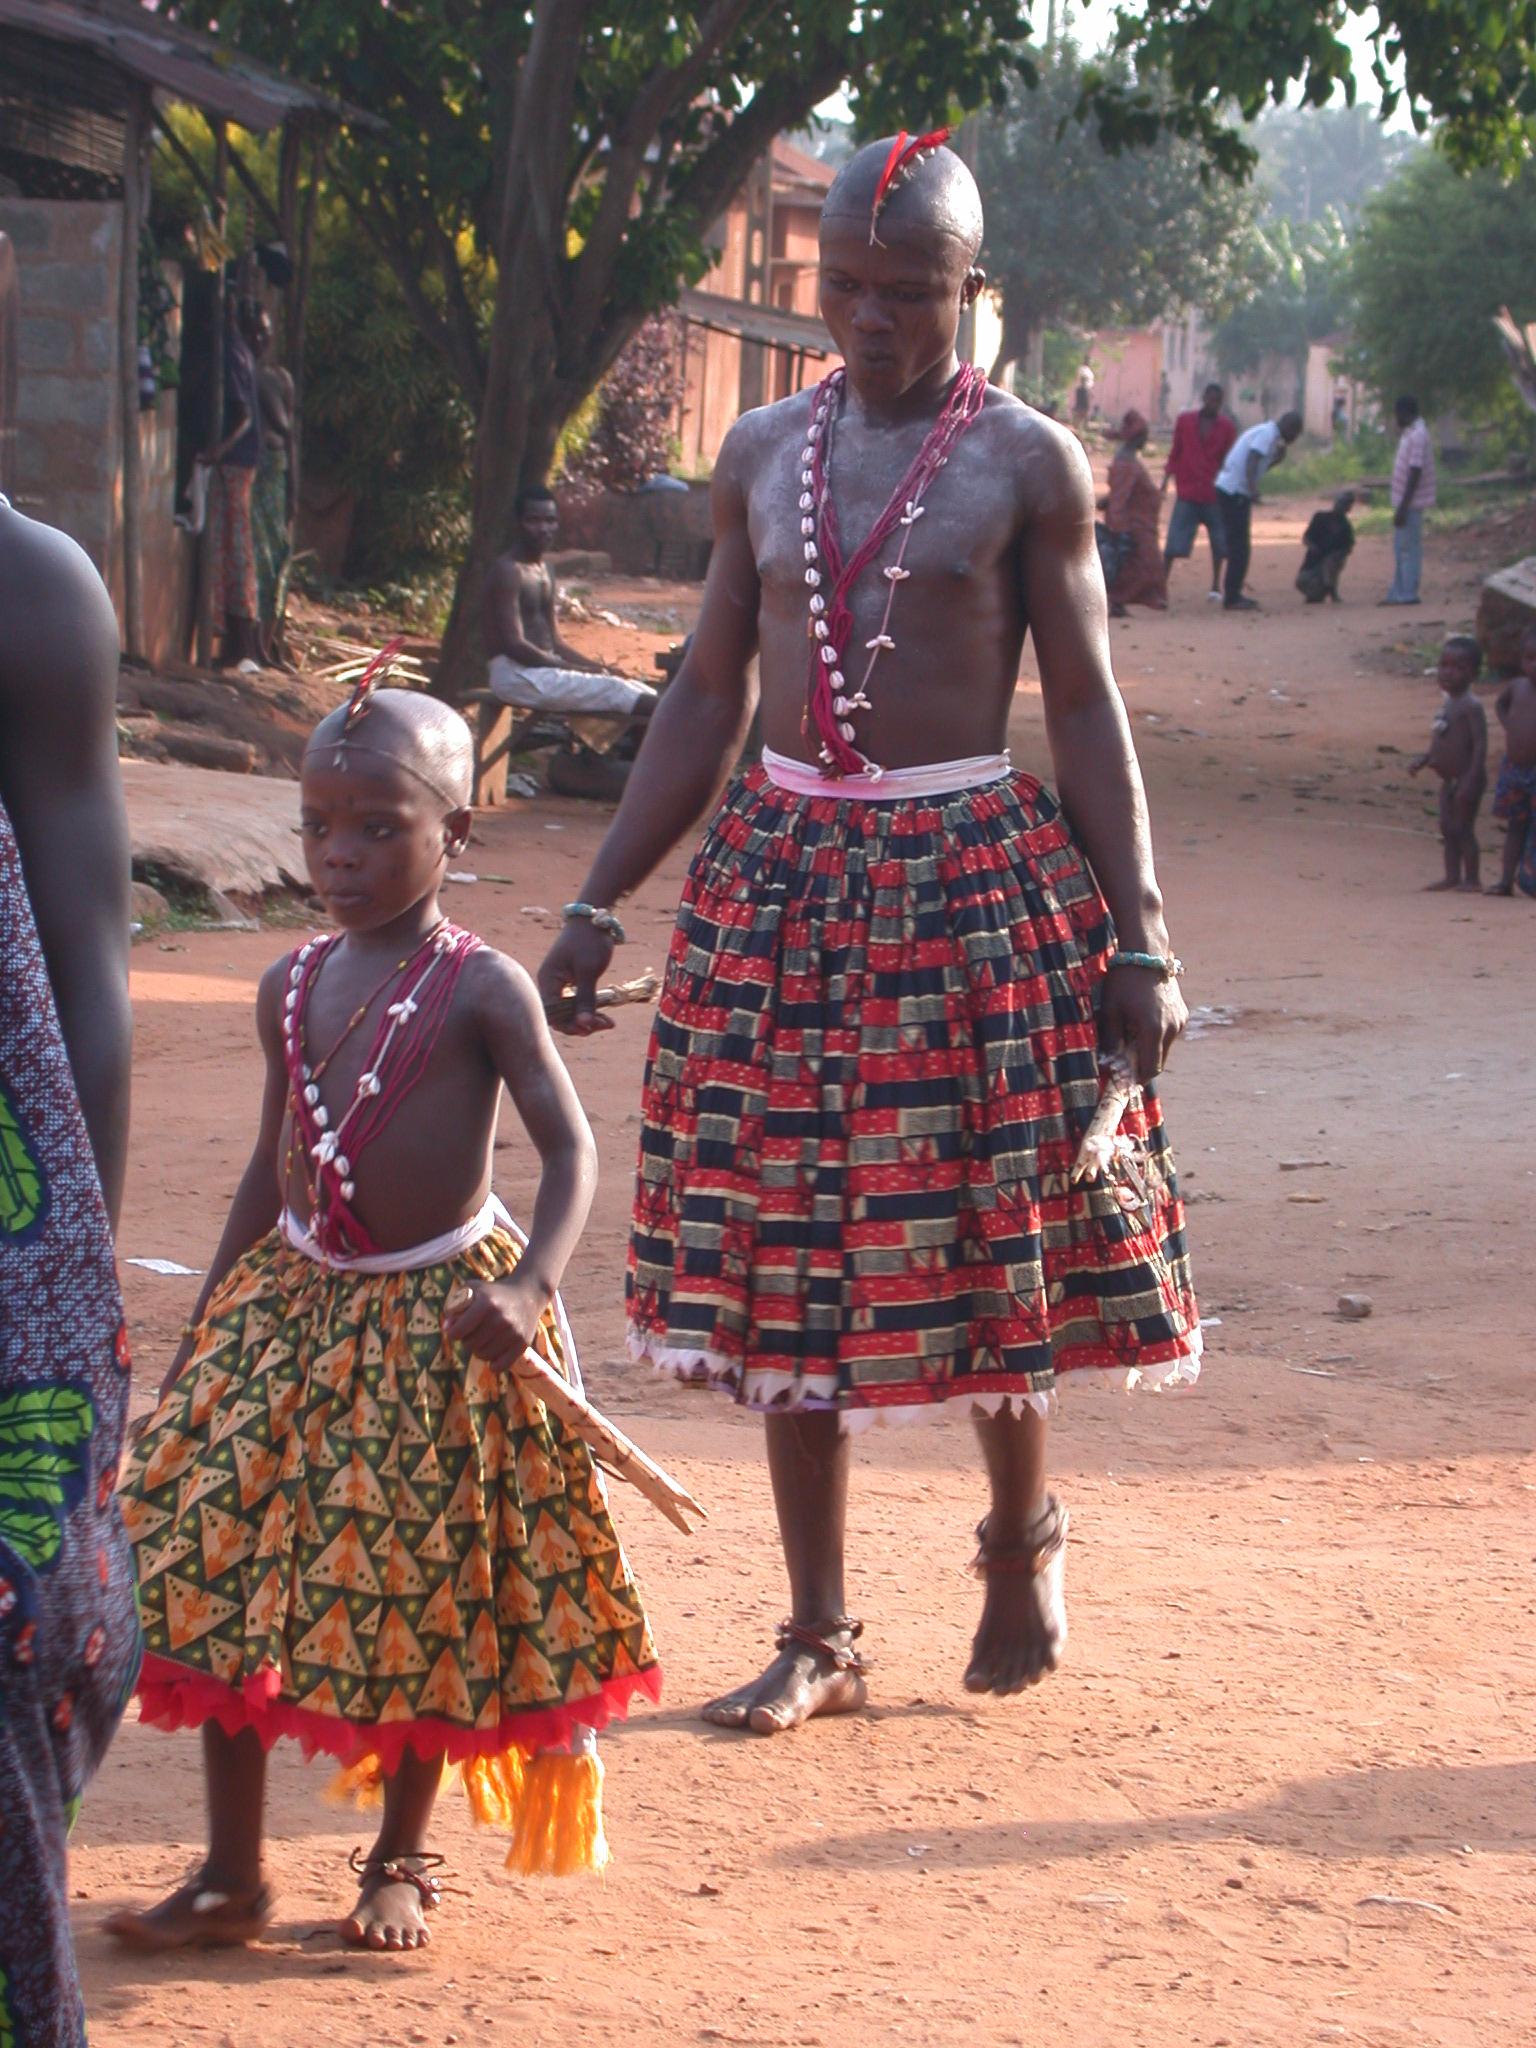 Gender-Bending Vodun Devotees, Vodun Ritual, Ouidah, Benin